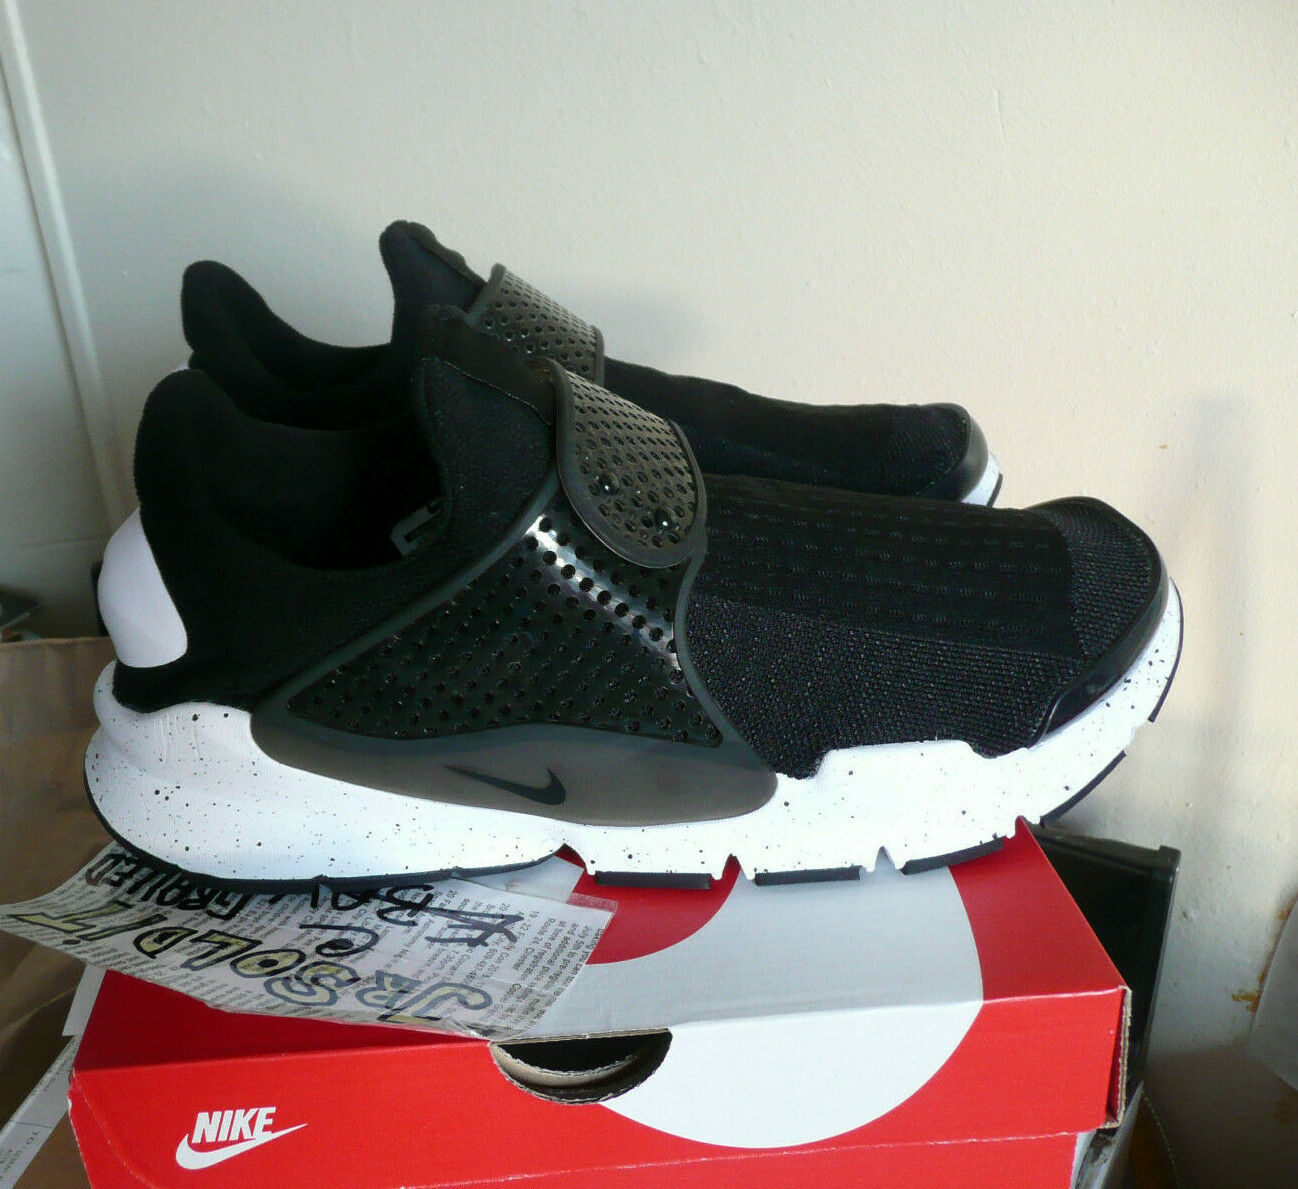 separation shoes d0445 2c9c8 Nike Sock Dart SE  Oreo   Oreo   Oreo  (2016)